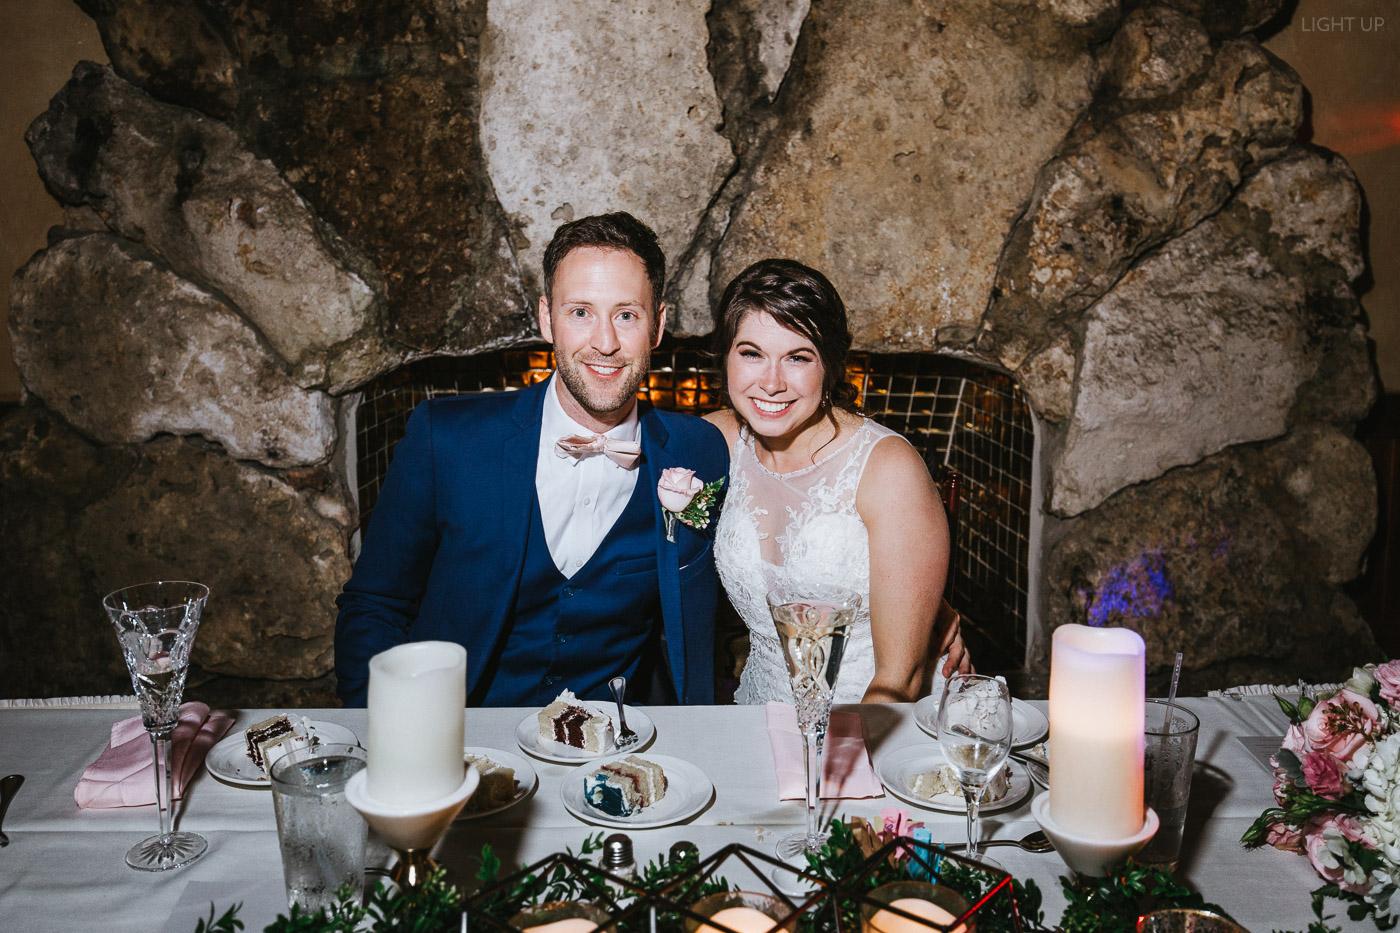 hstoric-dubsdread-wedding-orlando-75.jpg